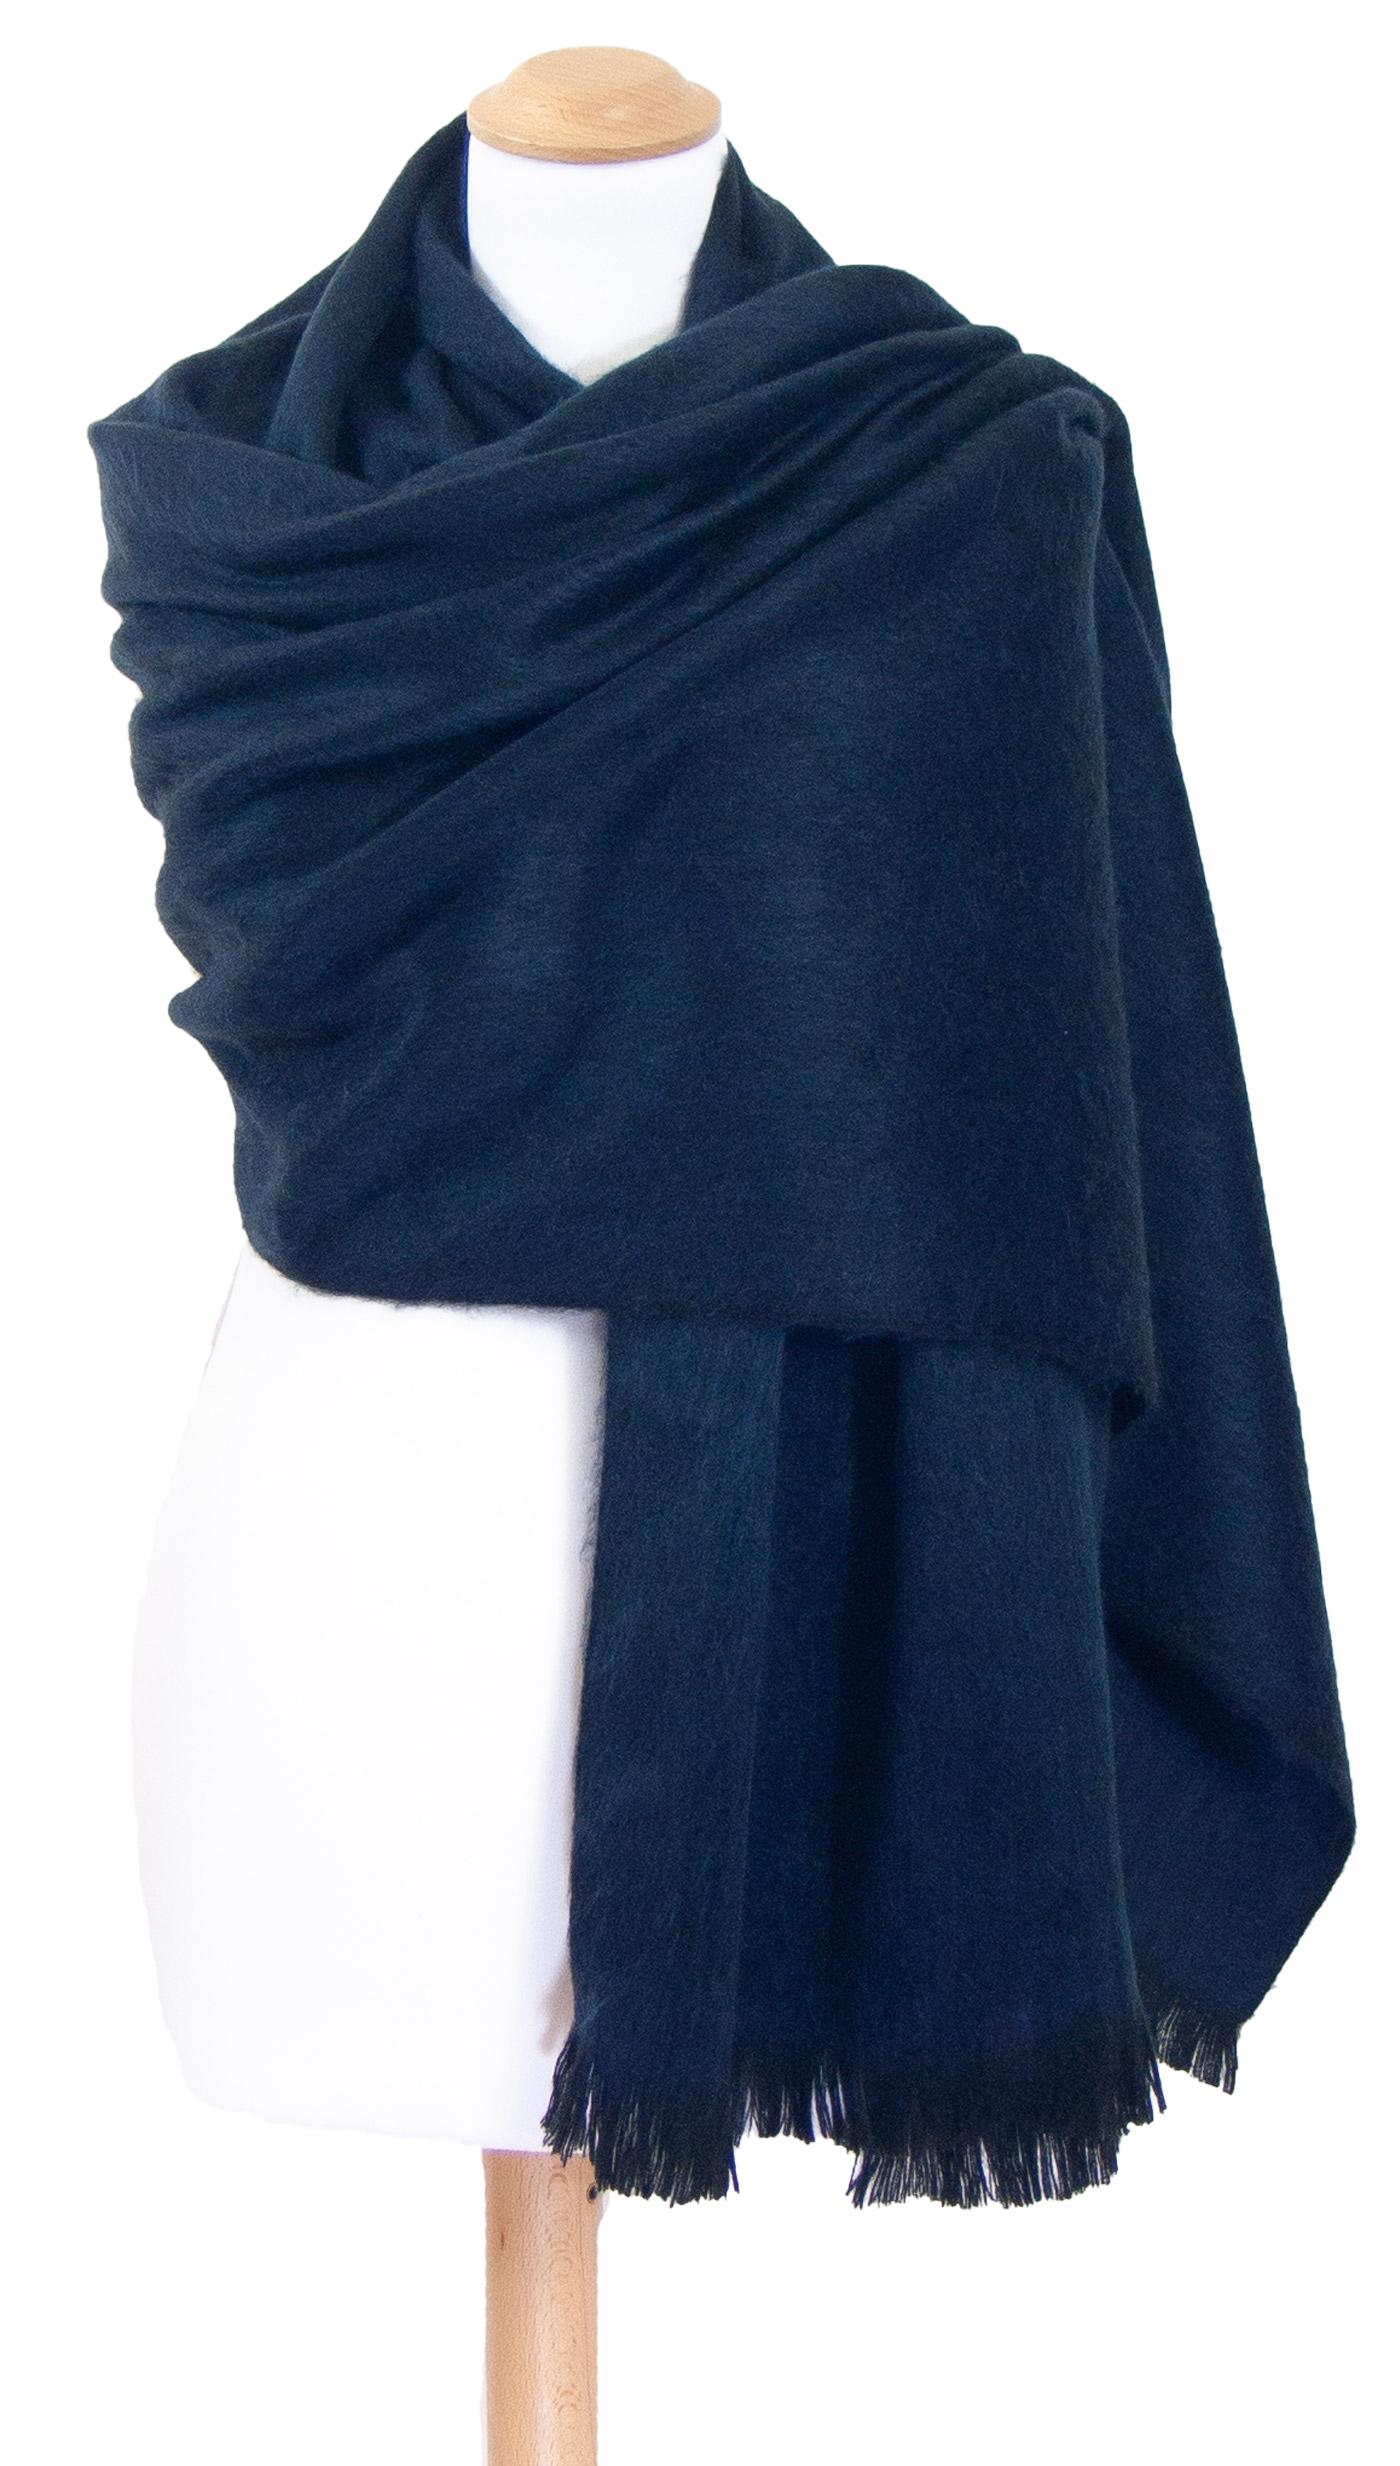 Châle en laine alpaga bleu marine